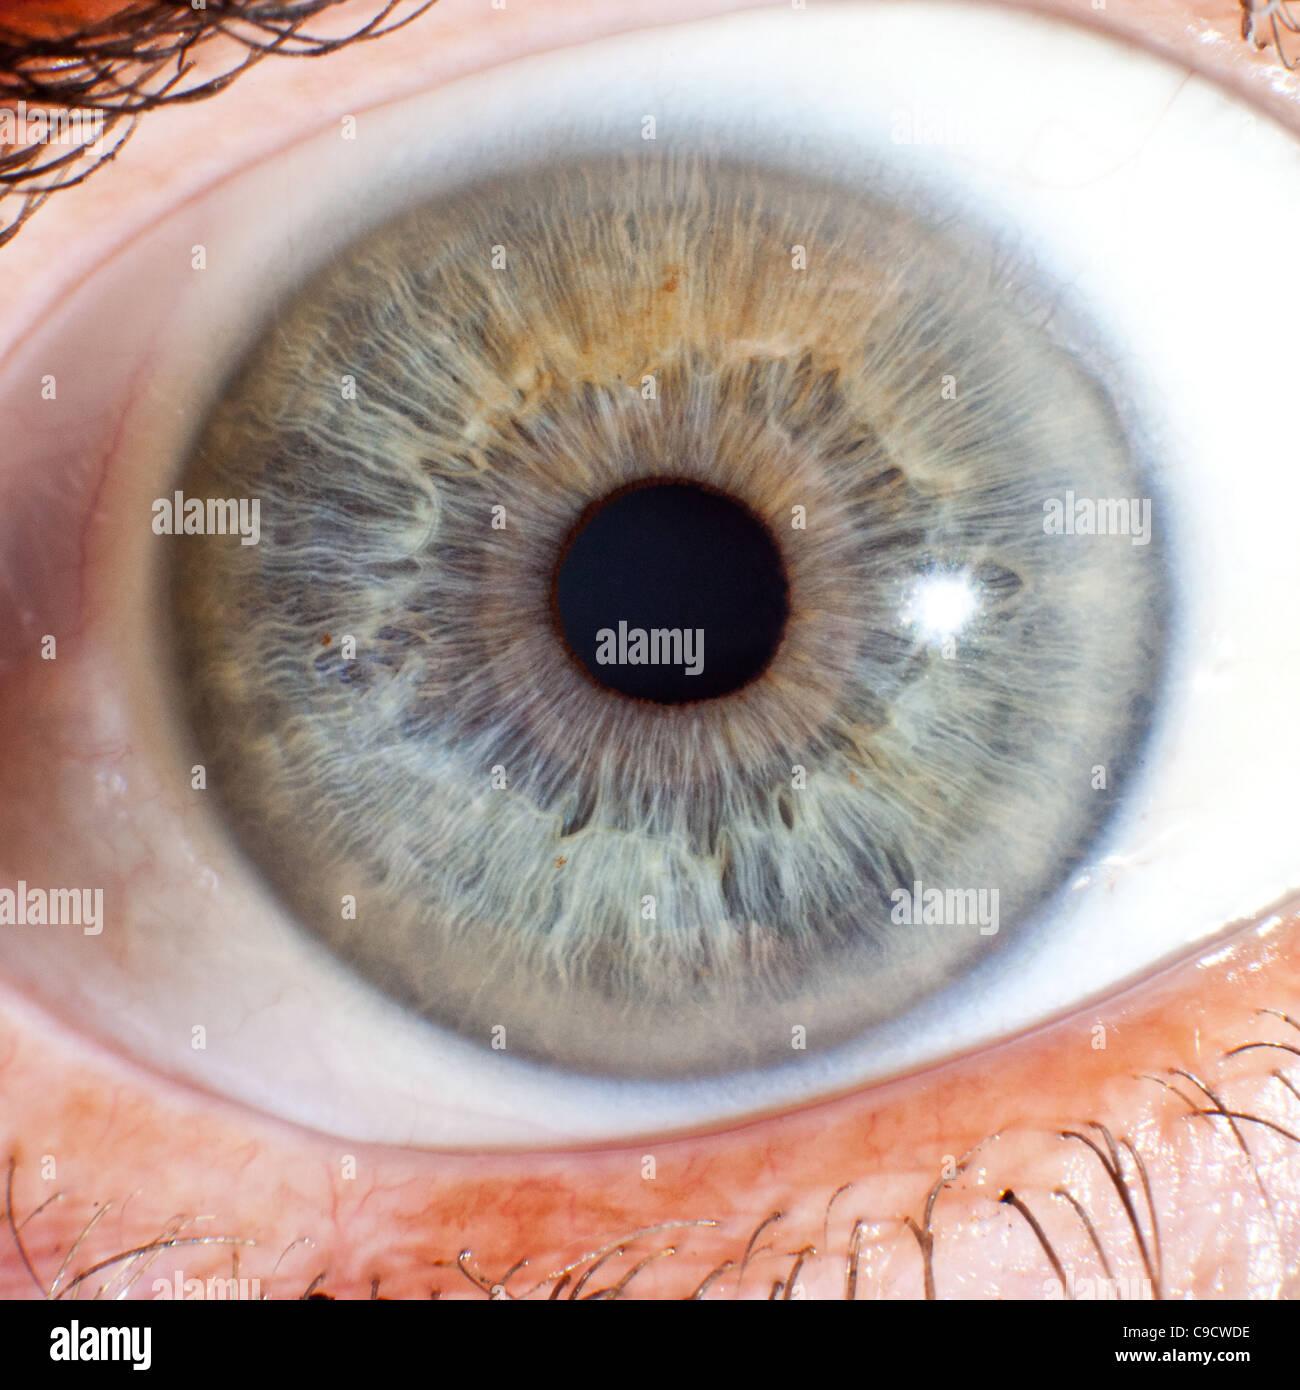 Makroaufnahme einer Auge Ball Iris und Pupille Stockbild